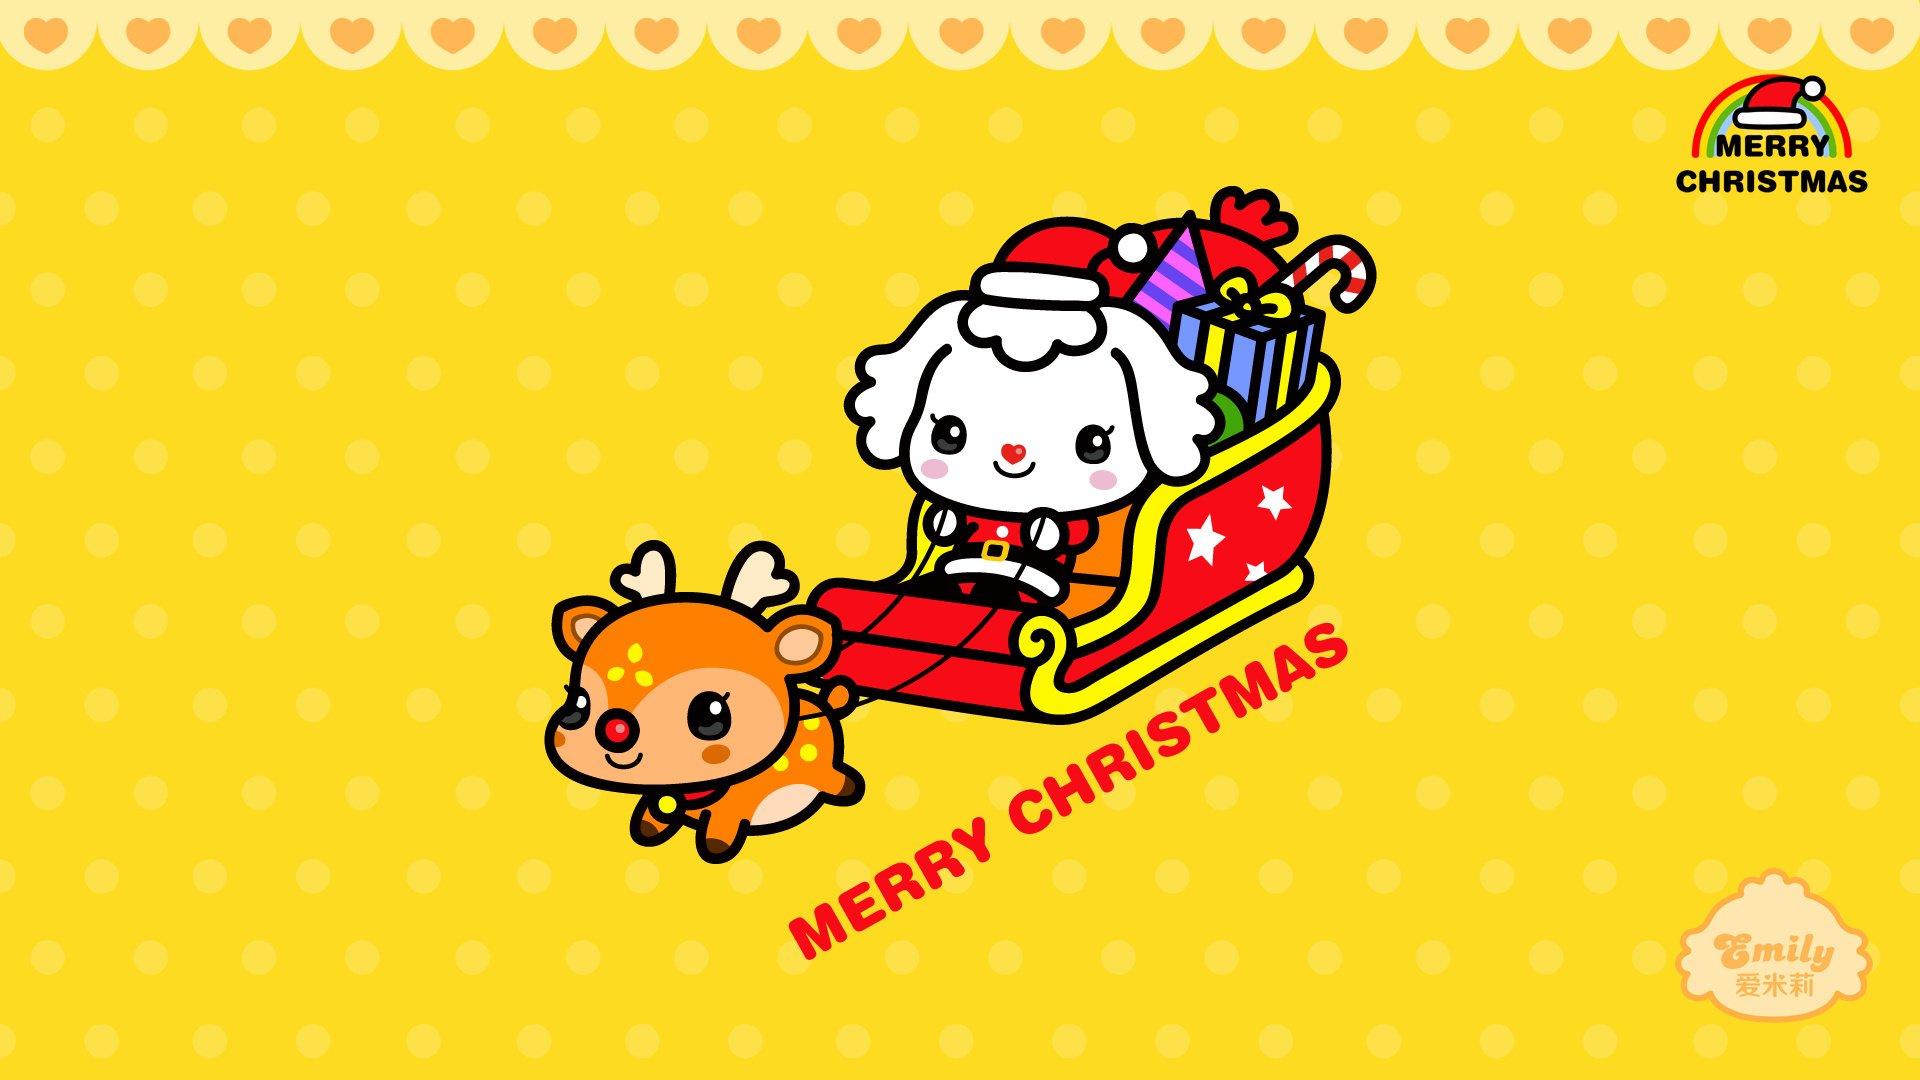 android安卓动漫 可爱 动画 手绘 圣诞节 爱米莉高清